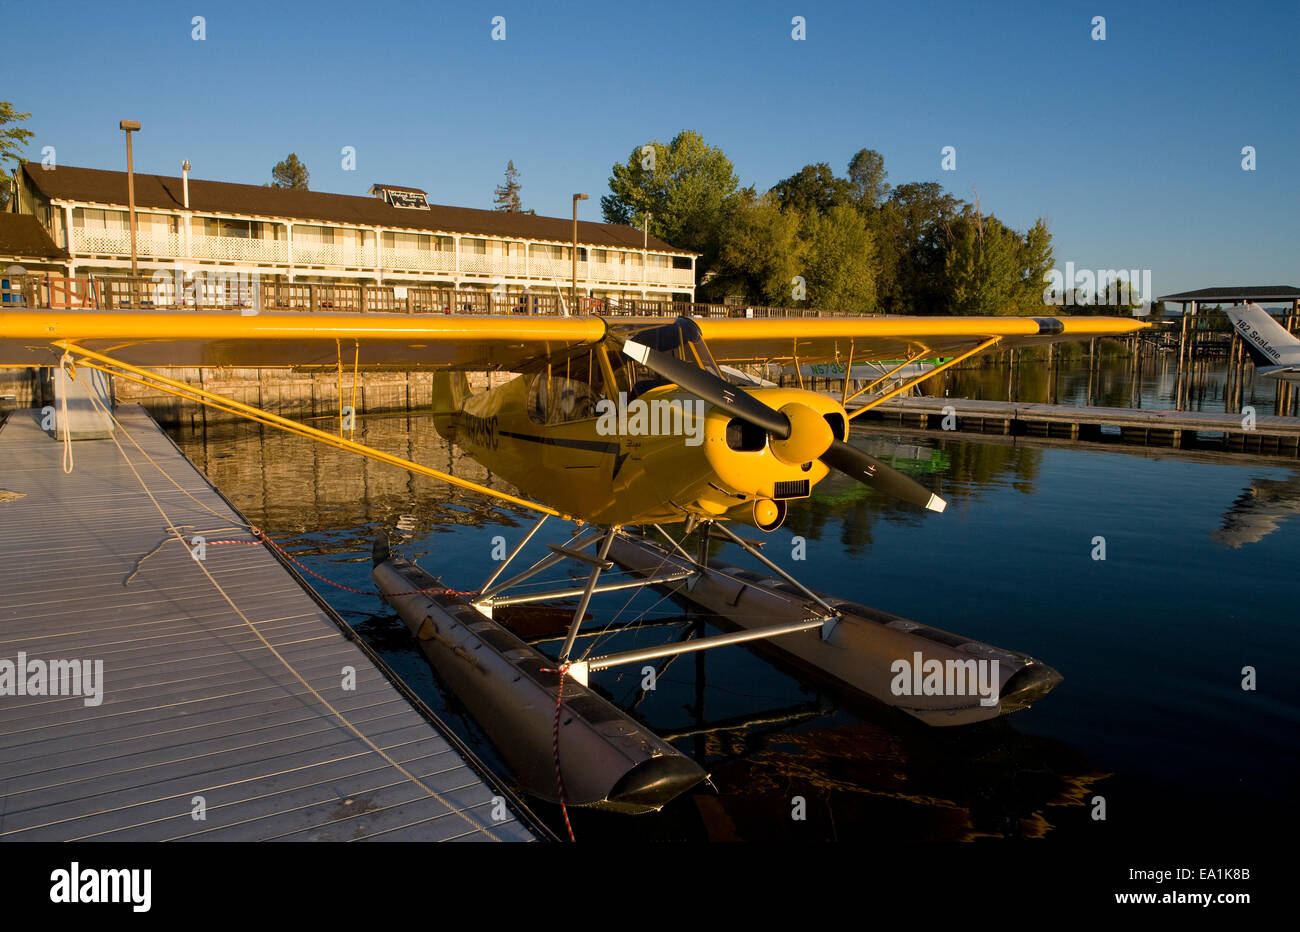 Piper Super Cub on Floats docked at the Sky Lark Shores Resort dock, Seaplane Splash-In, Lakeport, California, Lake - Stock Image